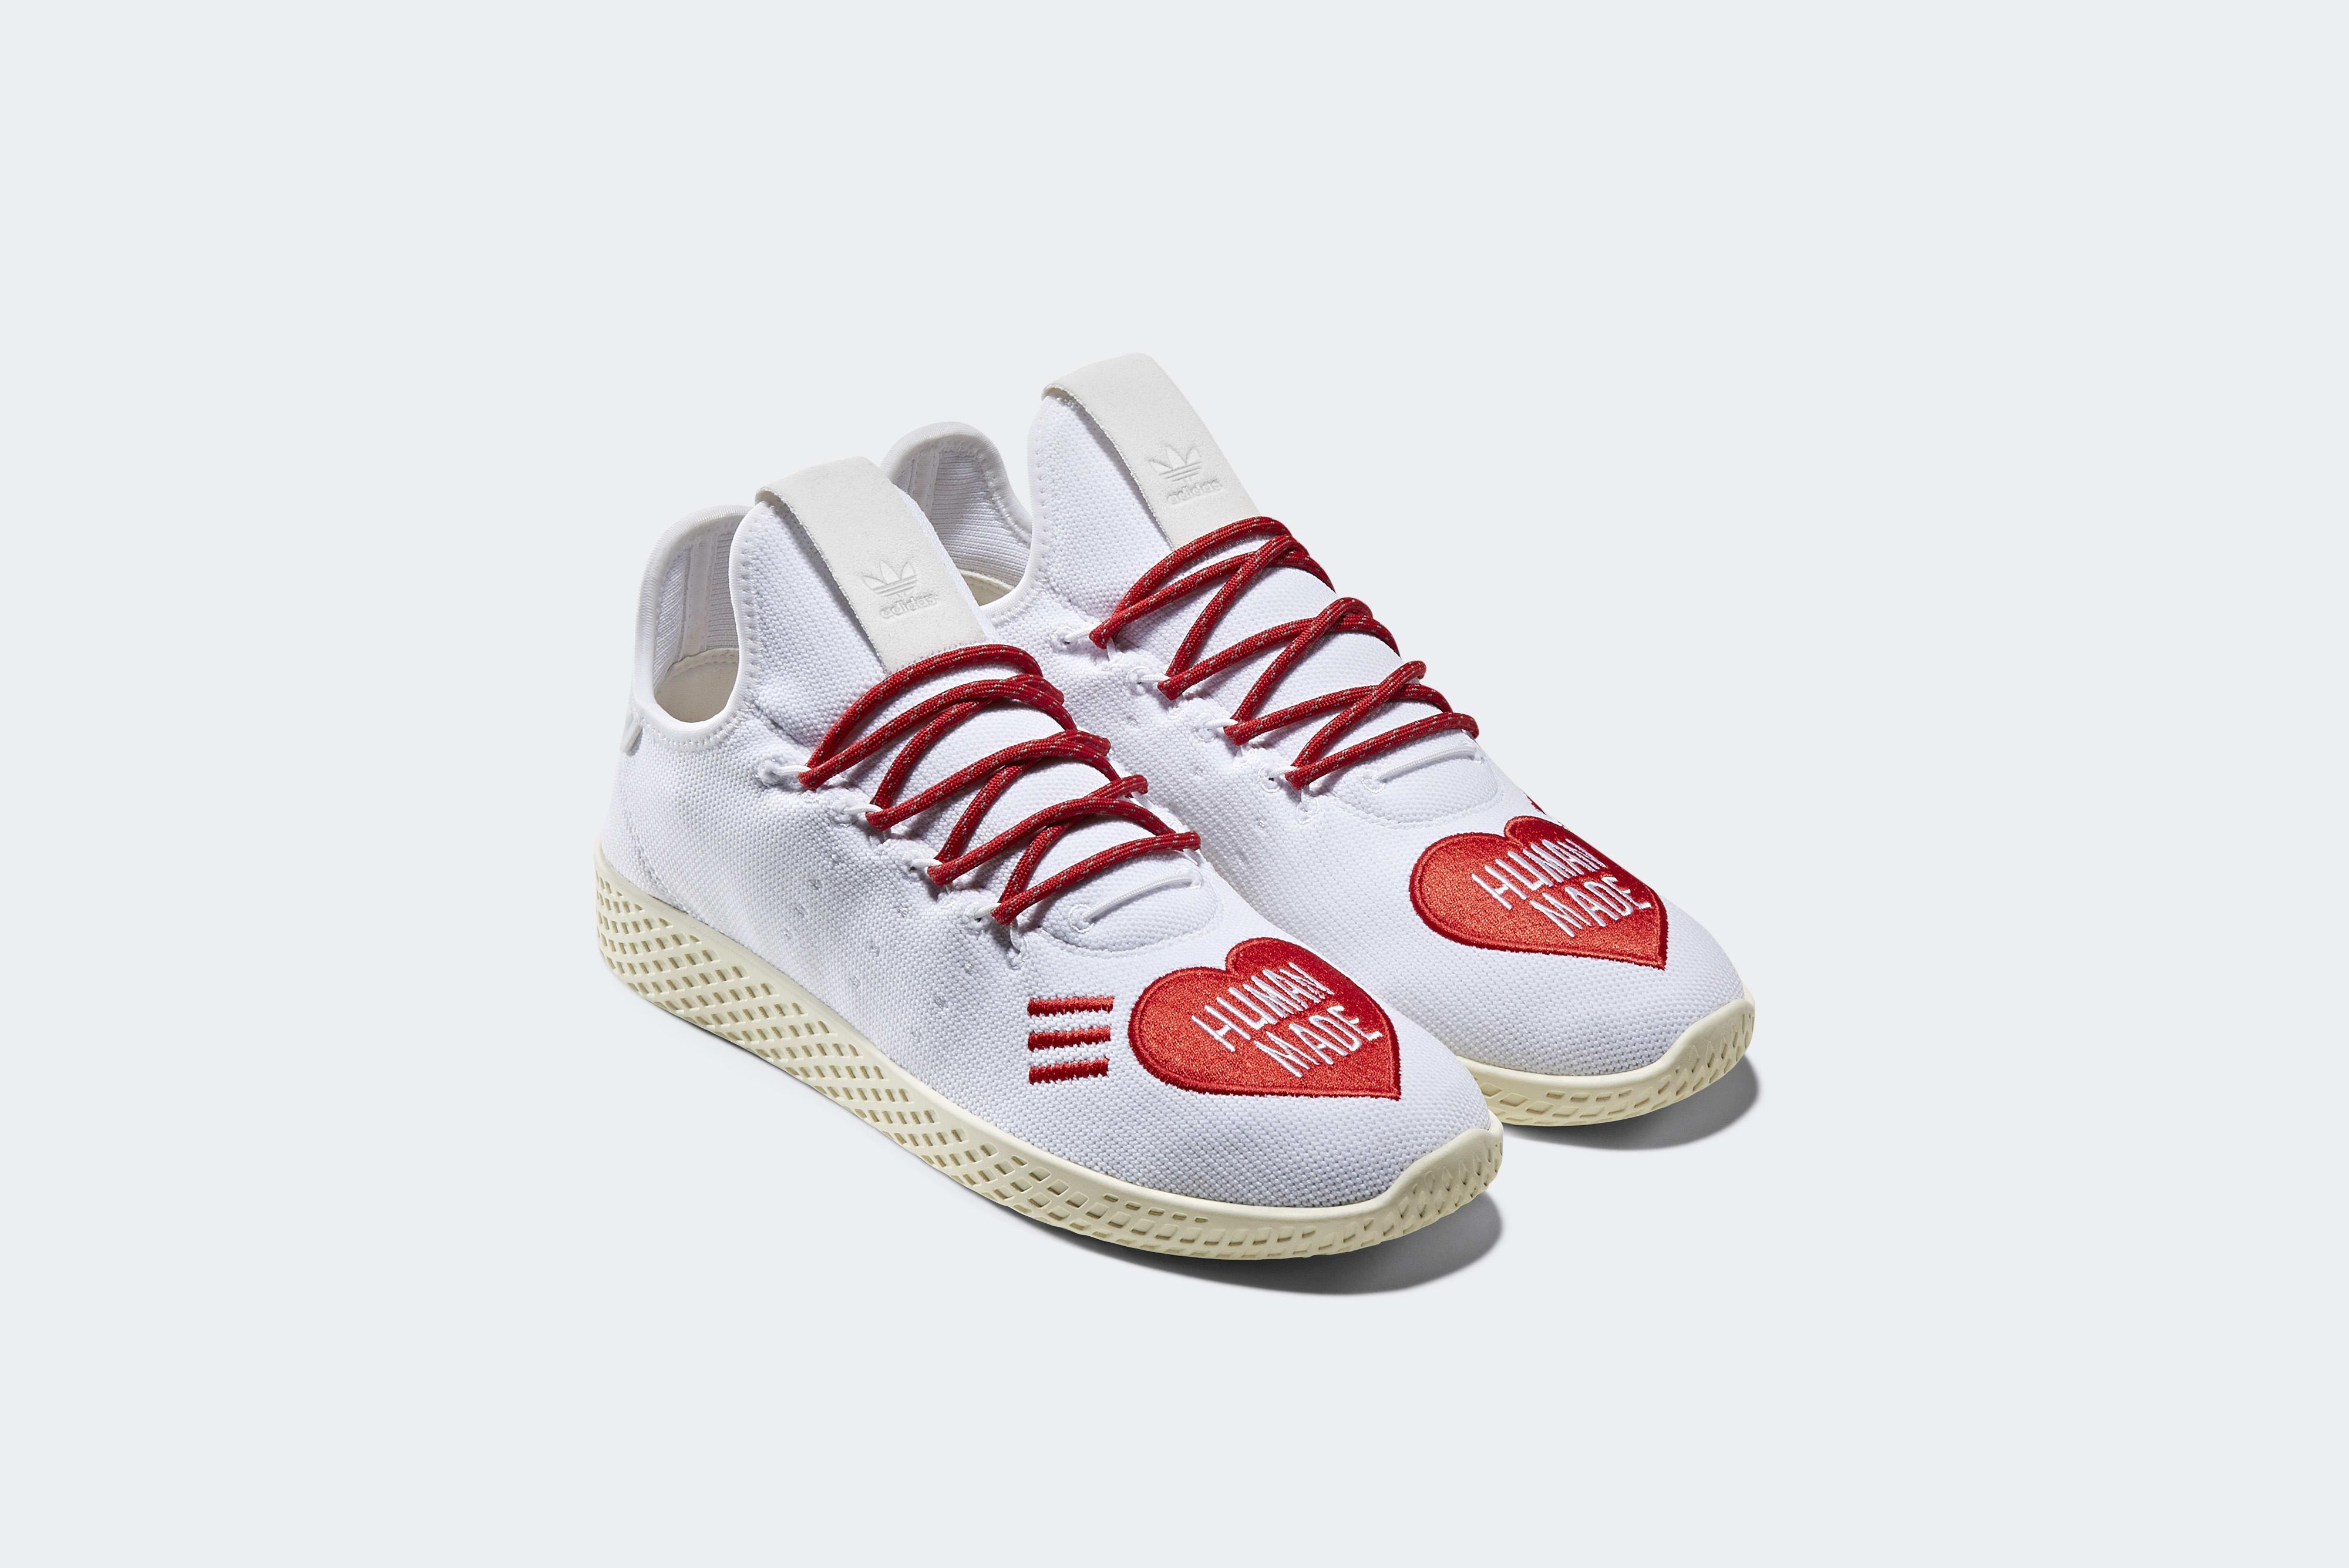 adidas Consortium x Human Made x Pharrell Williams NMD Hu